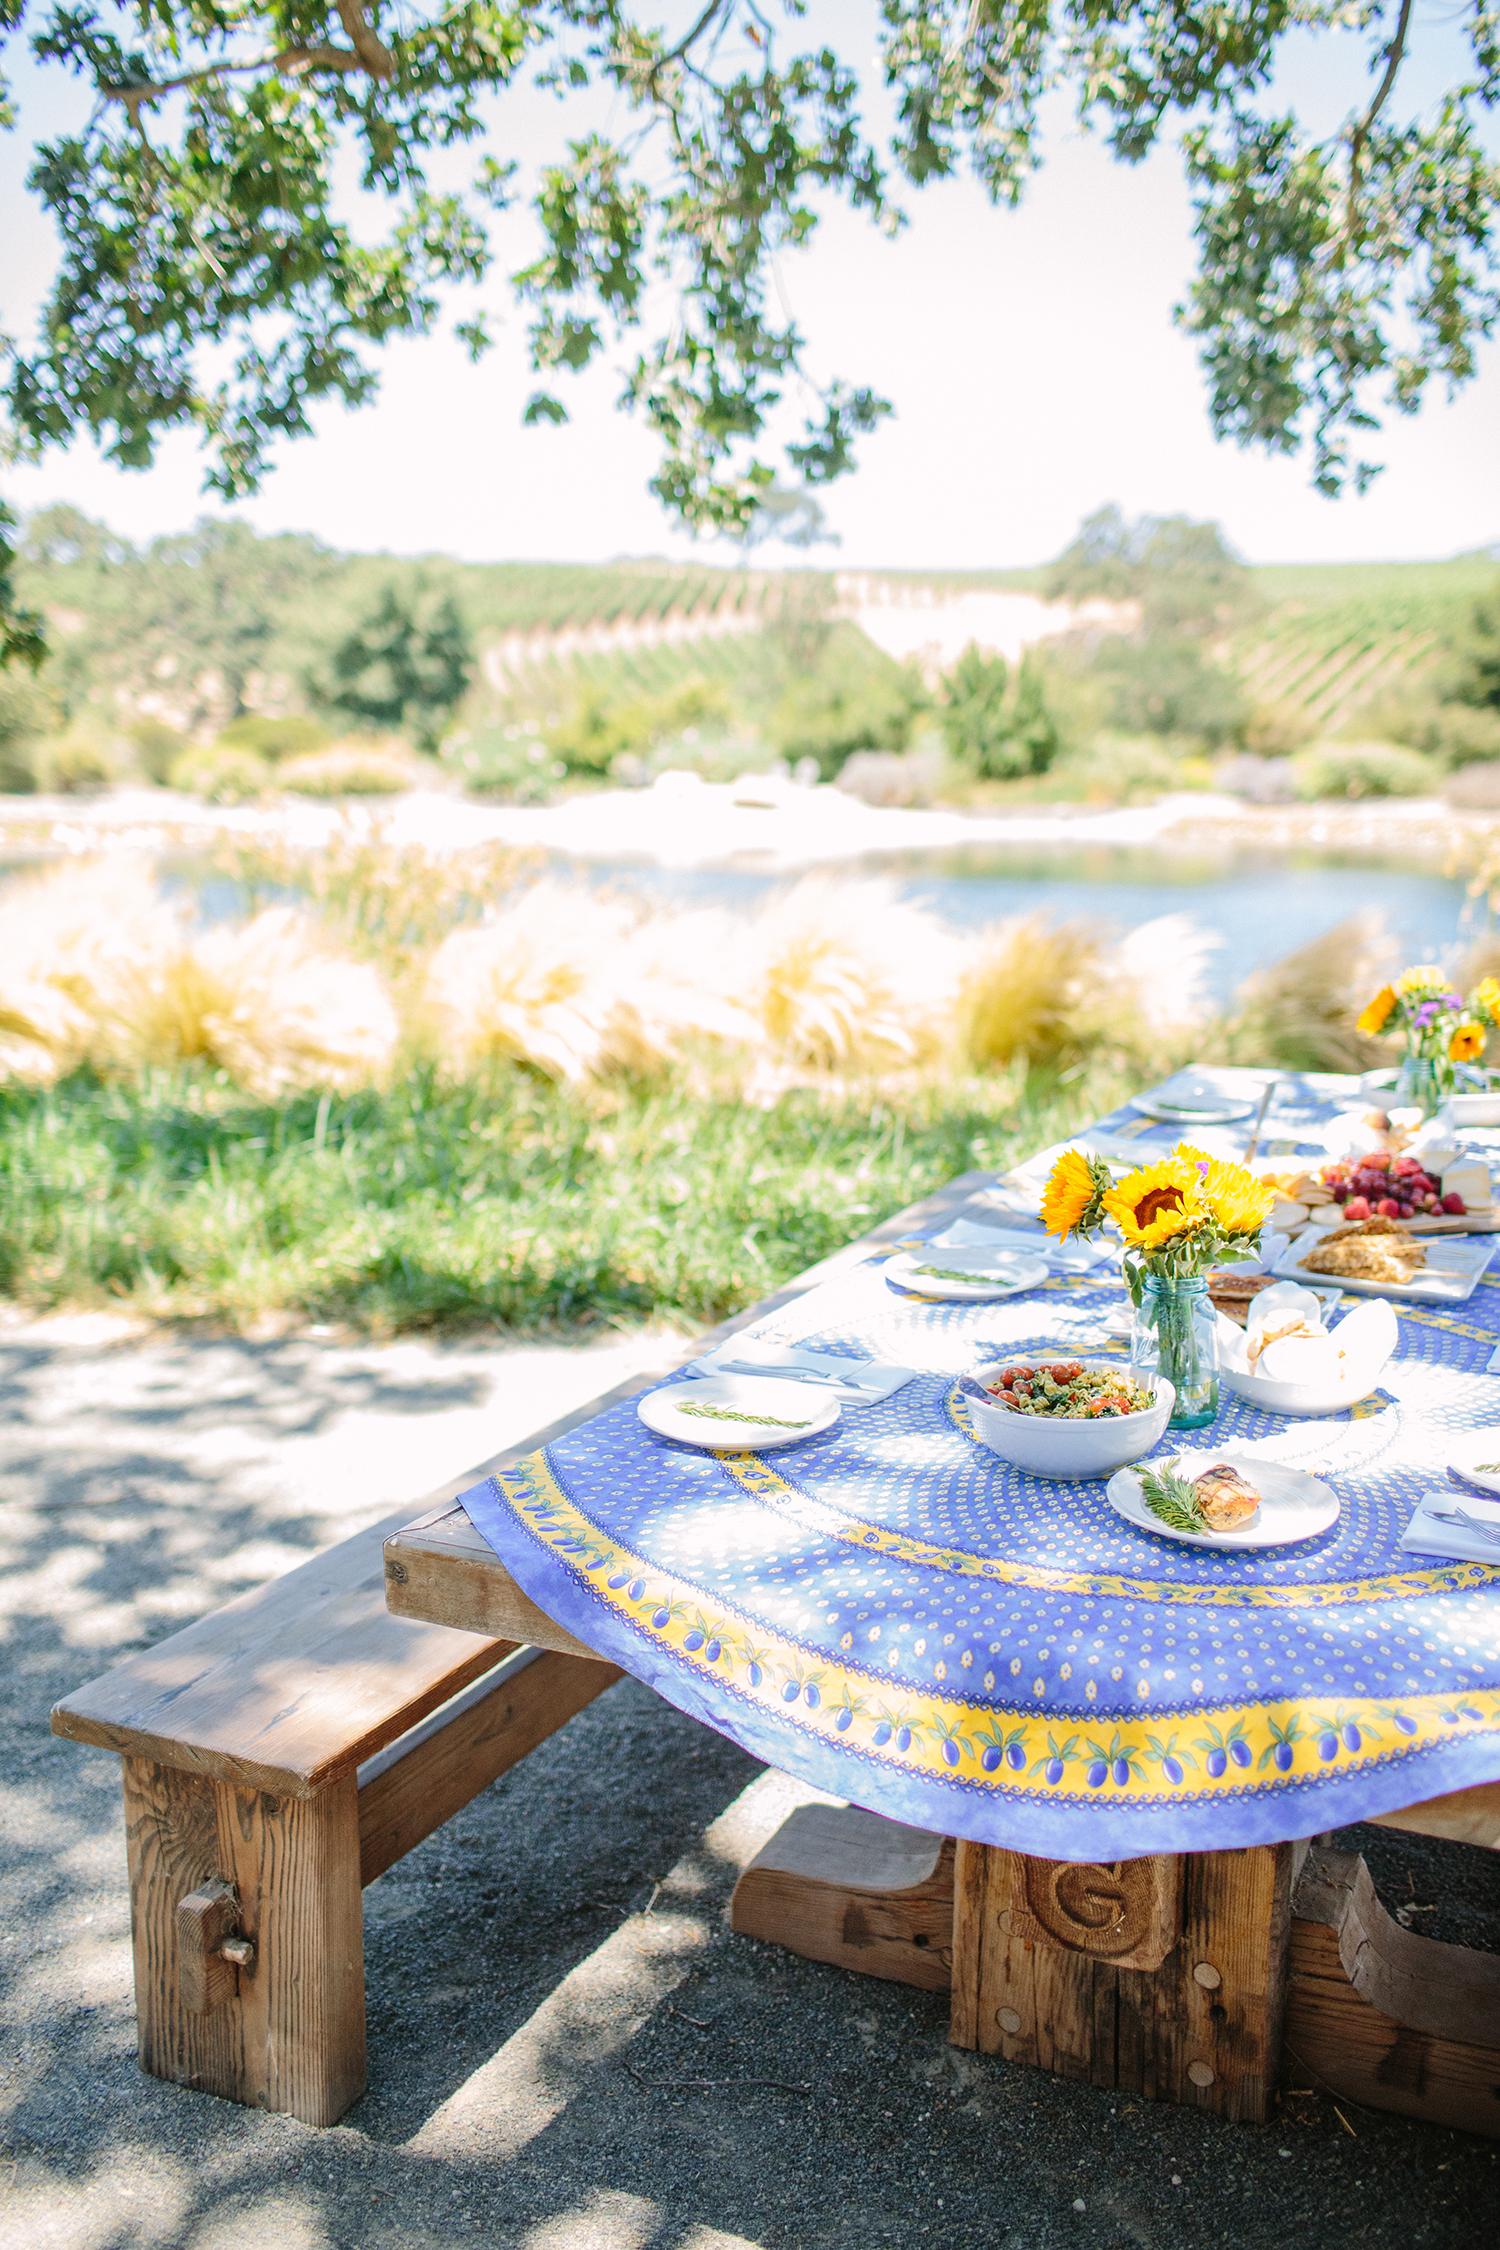 Wine Touring in Santa Ynez Valley | Coastal Concierge | Grassini Vineyard | Hilliard Bruce Vineyard | The Editor's Touch | Santa Barbara Trip Planning | I Heart My Groom Photography